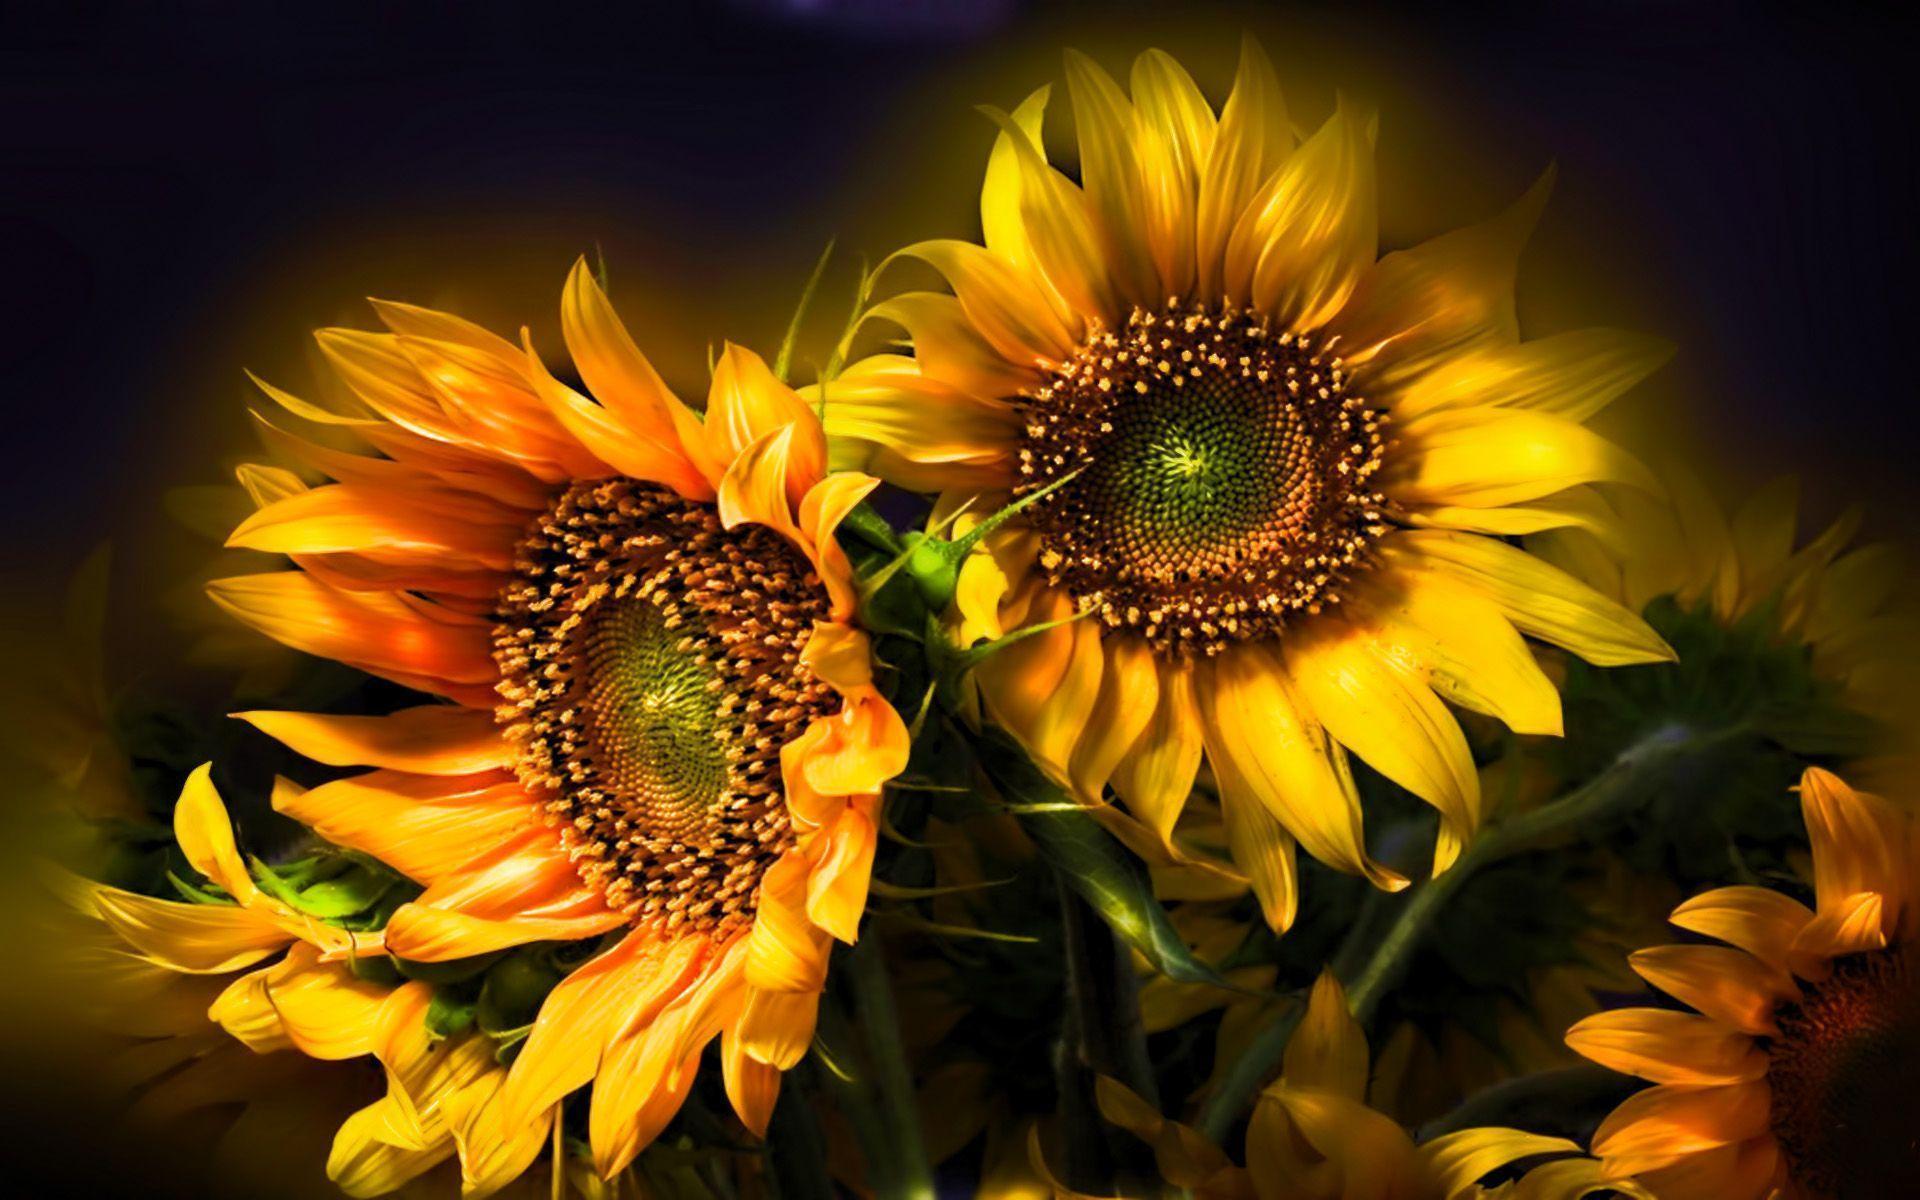 Sunflower Wallpapers Wallpaper Cave